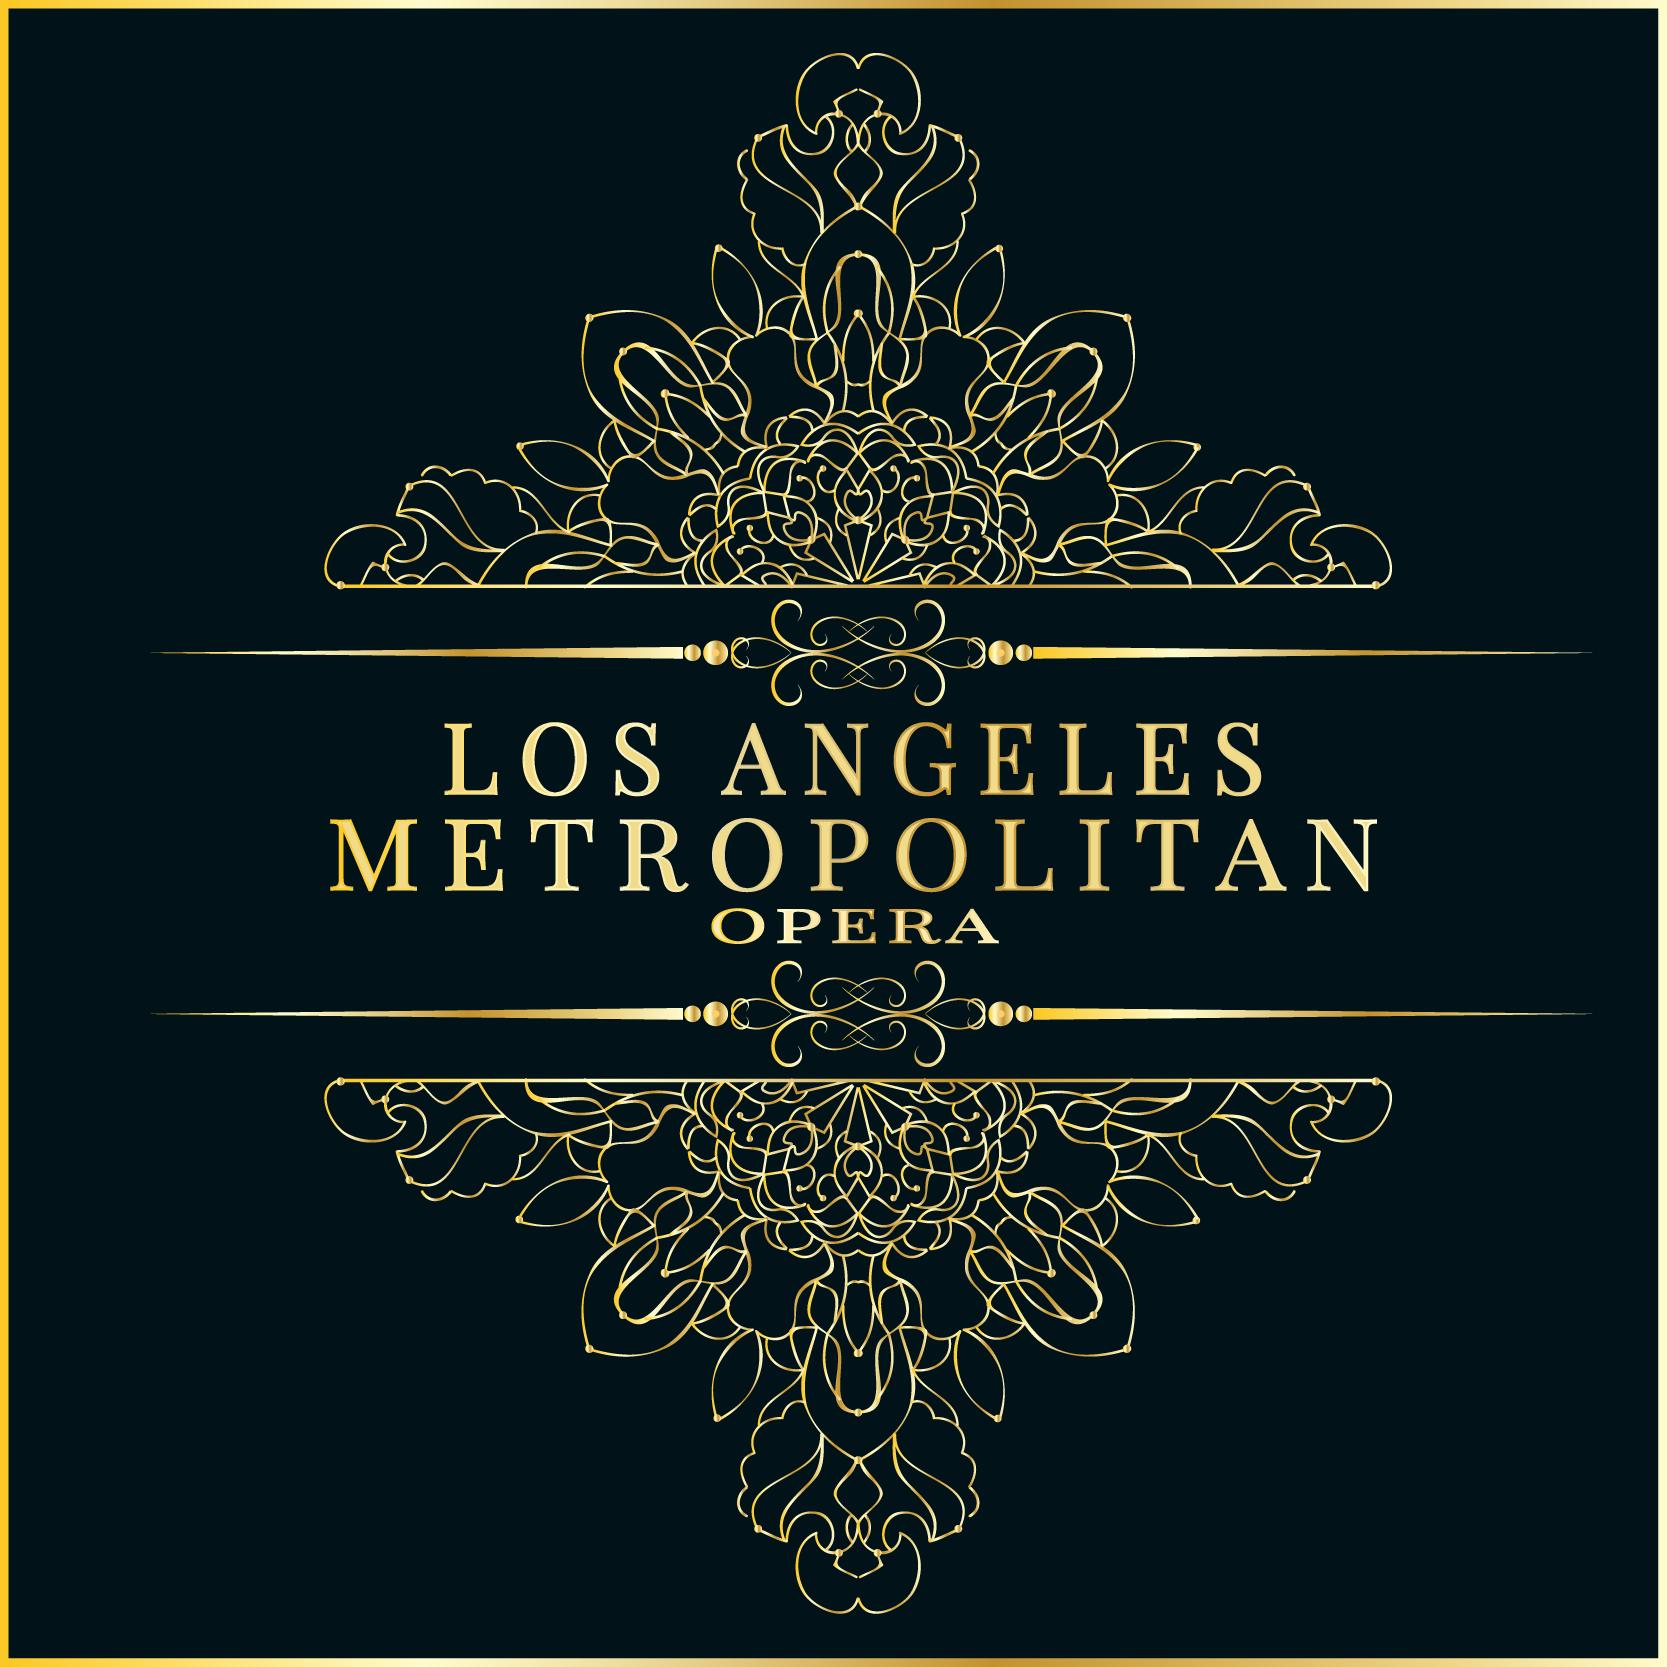 Los Angeles Metropolitan Opera